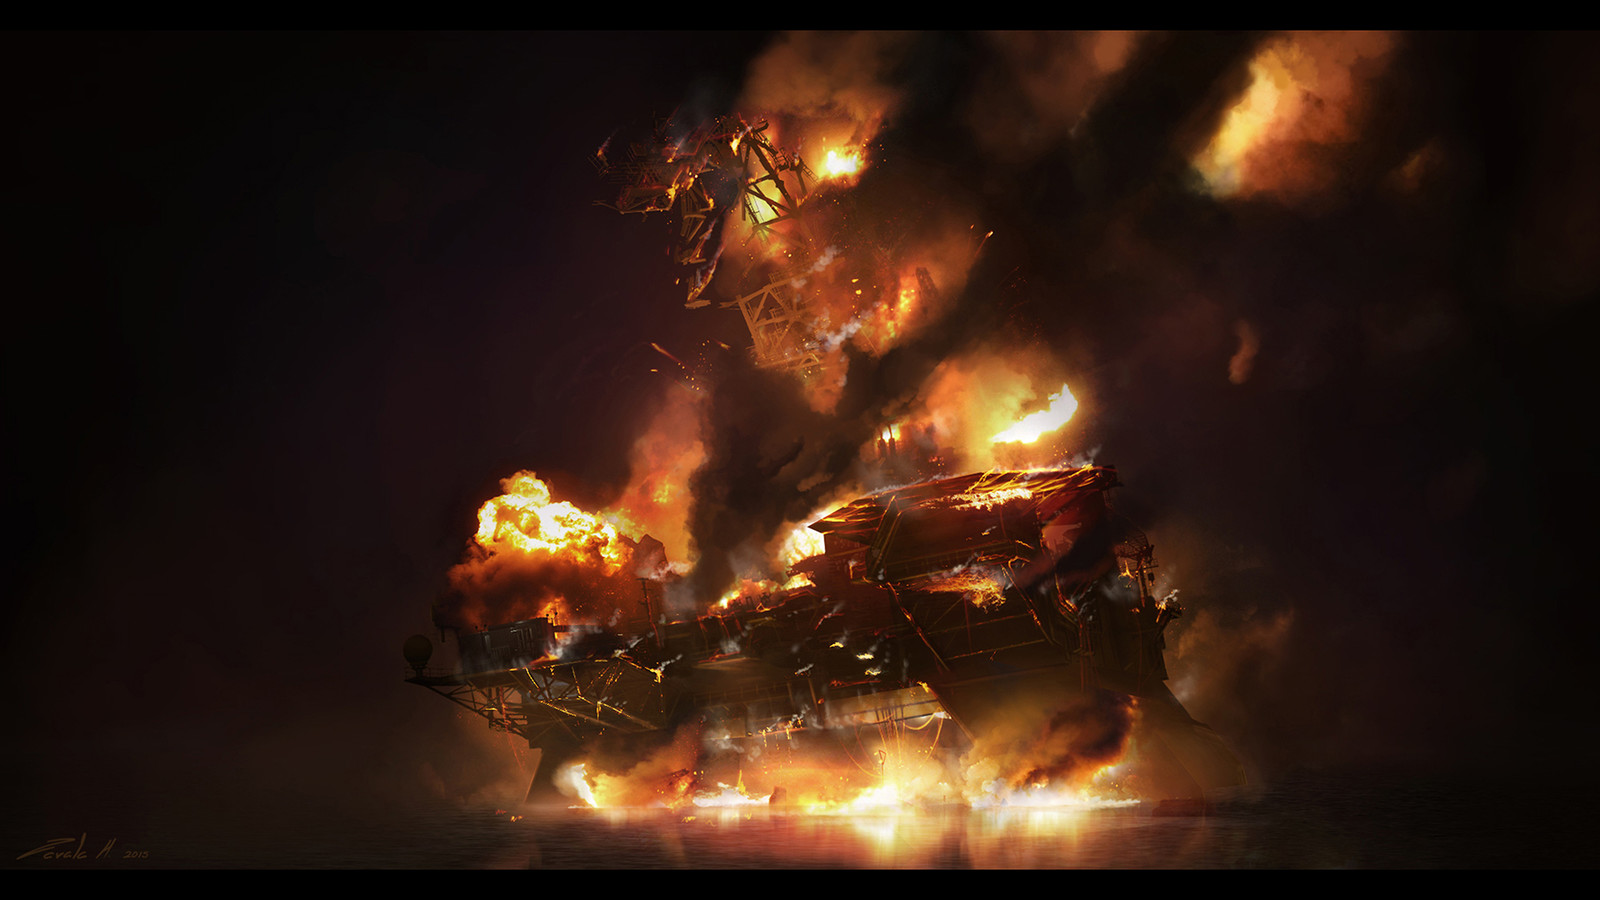 Deepwater Horizon Inferno early sketch